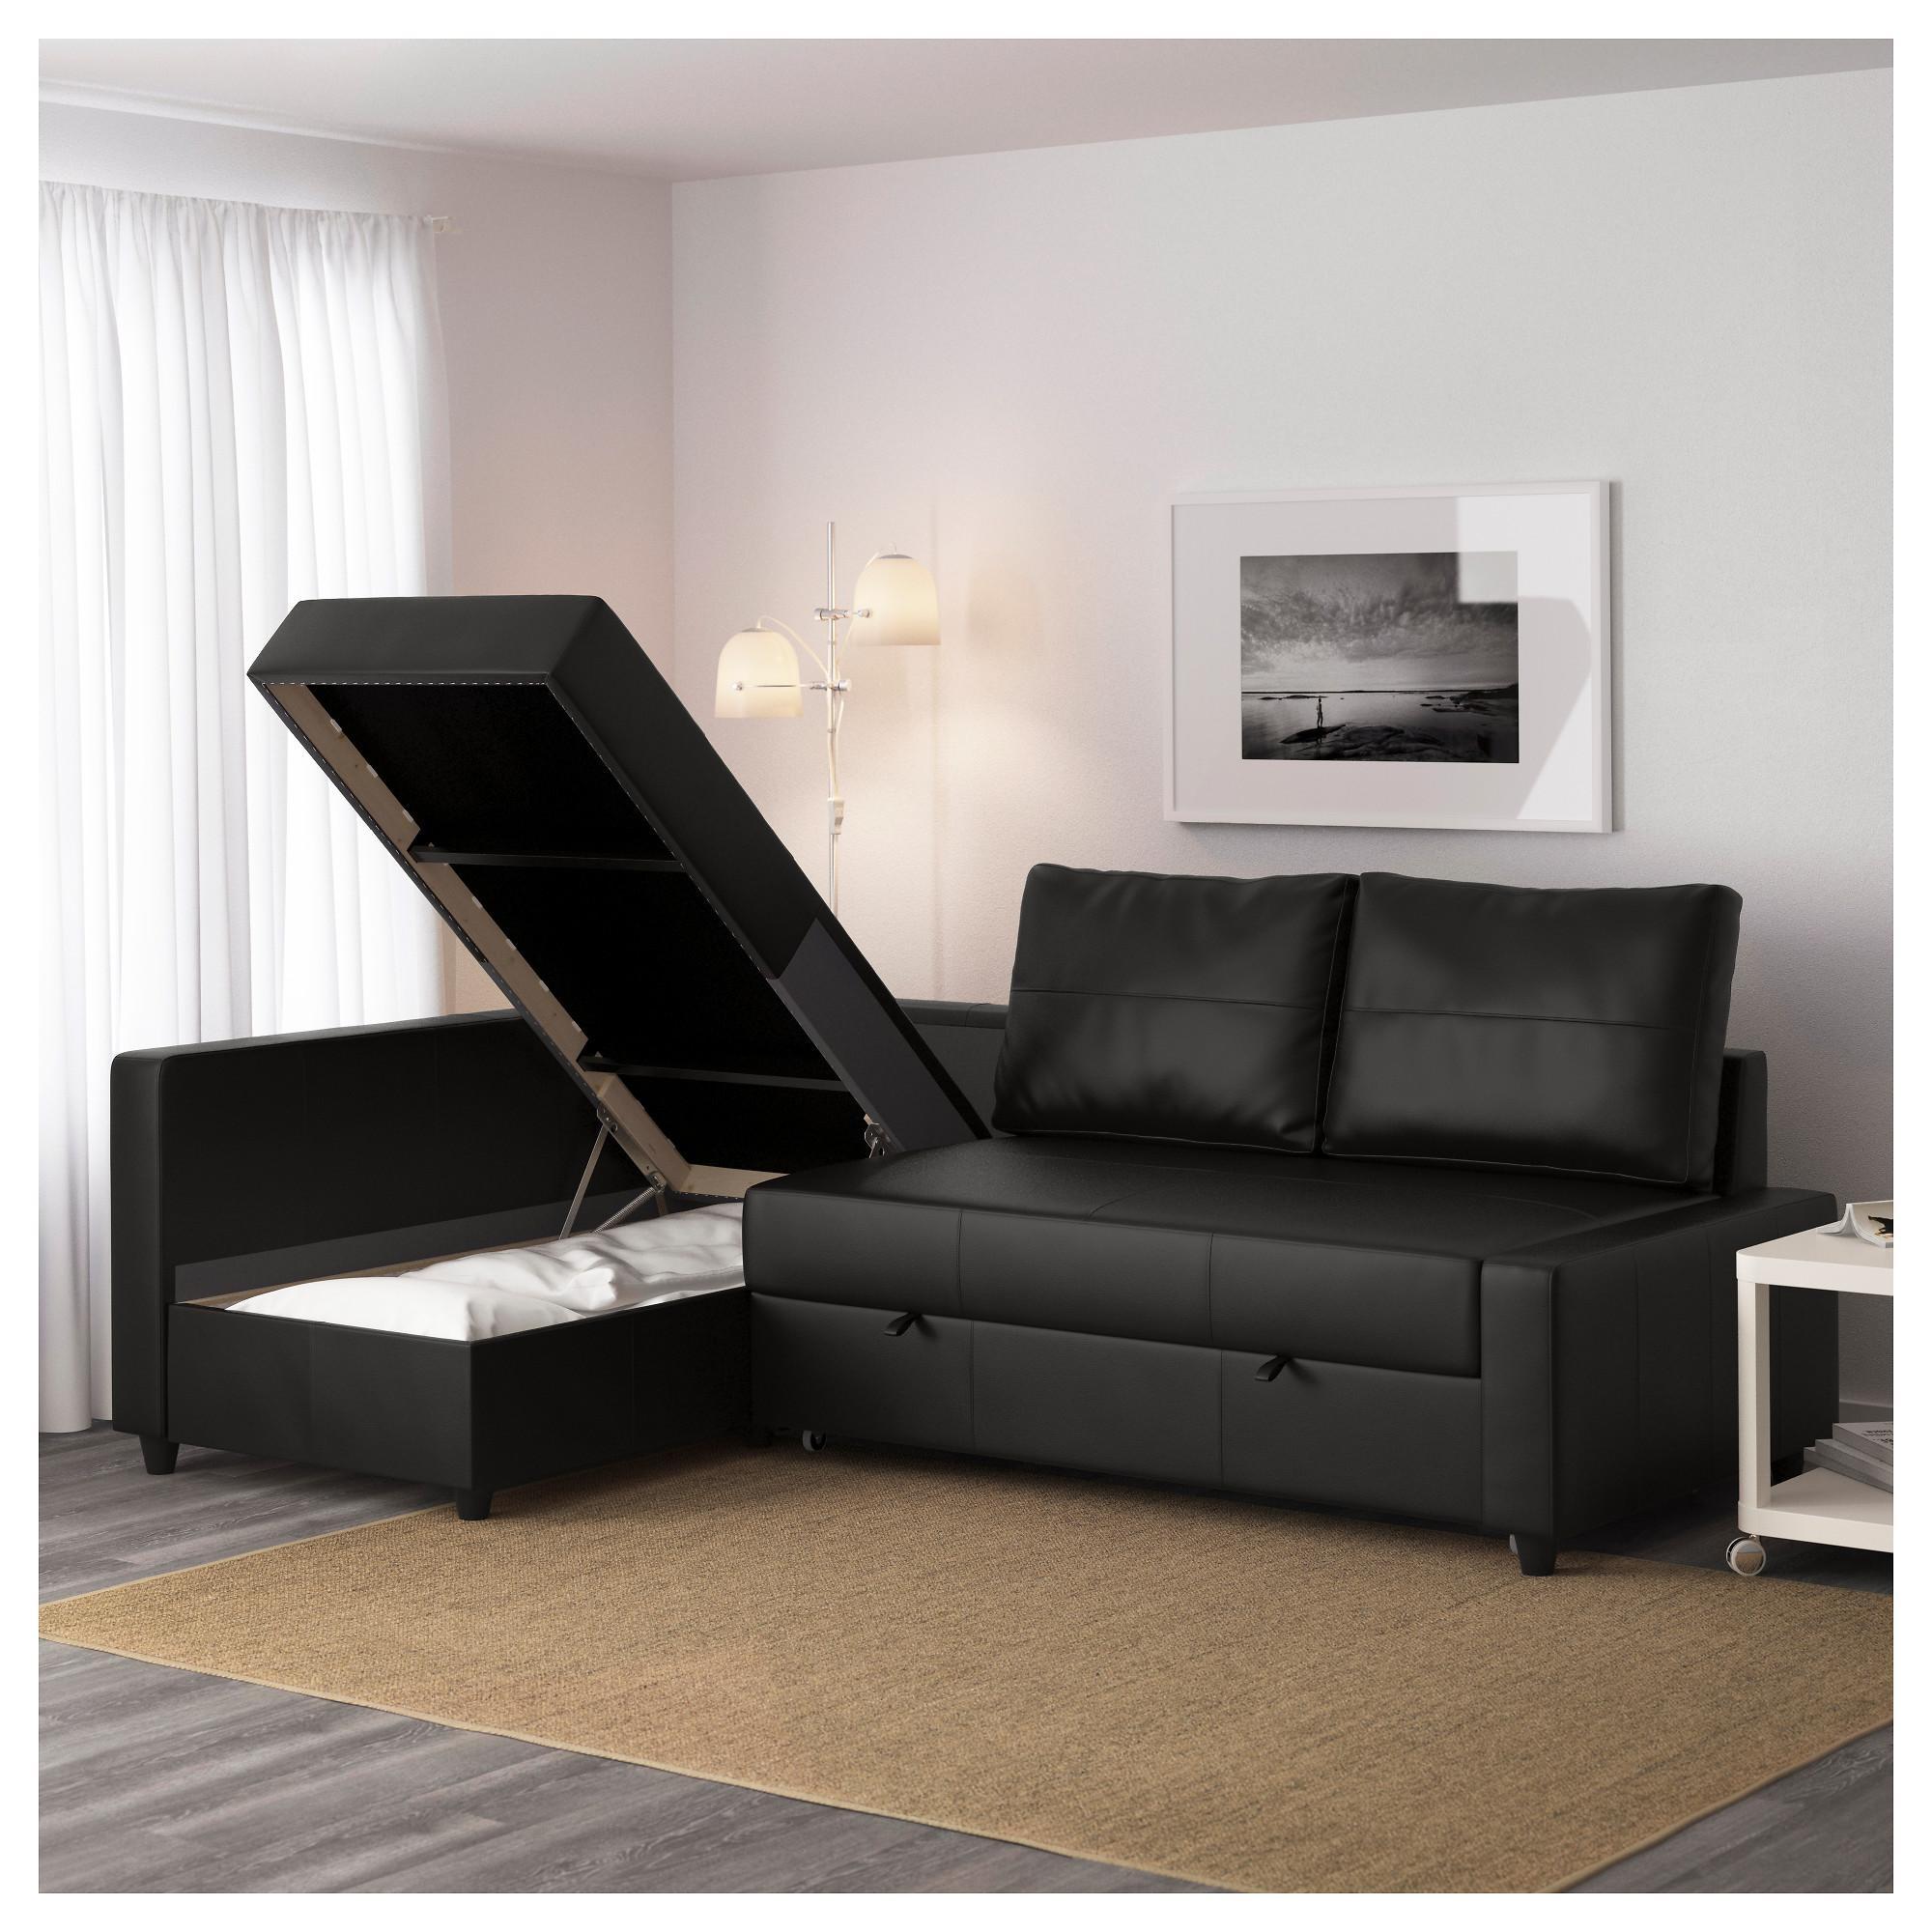 Friheten Sleeper Sectional,3 Seat W/storage – Skiftebo Dark Gray For Leather Storage Sofas (View 4 of 21)